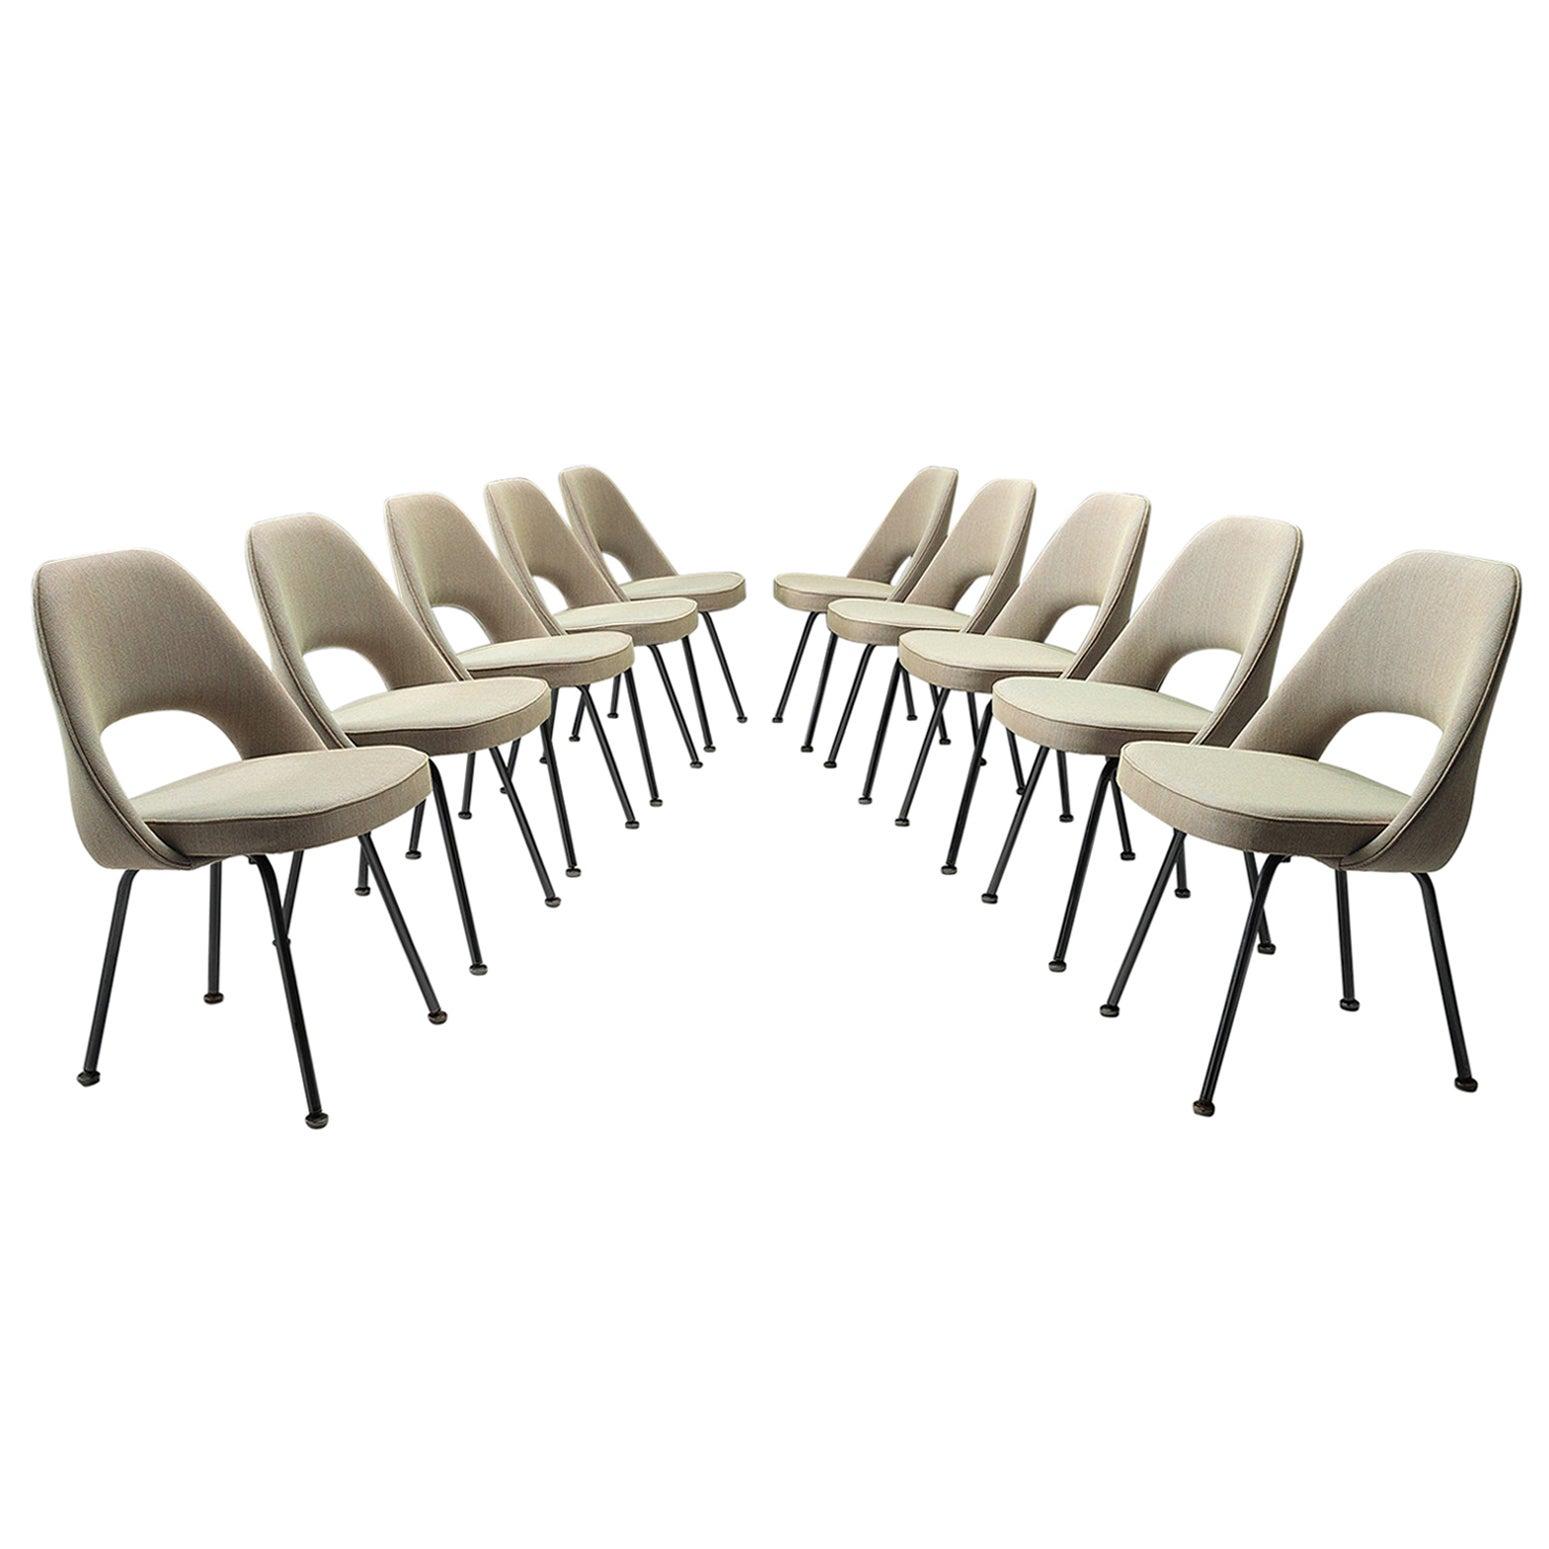 "Eero Saarinen for Knoll ""Model 72"" Chairs"